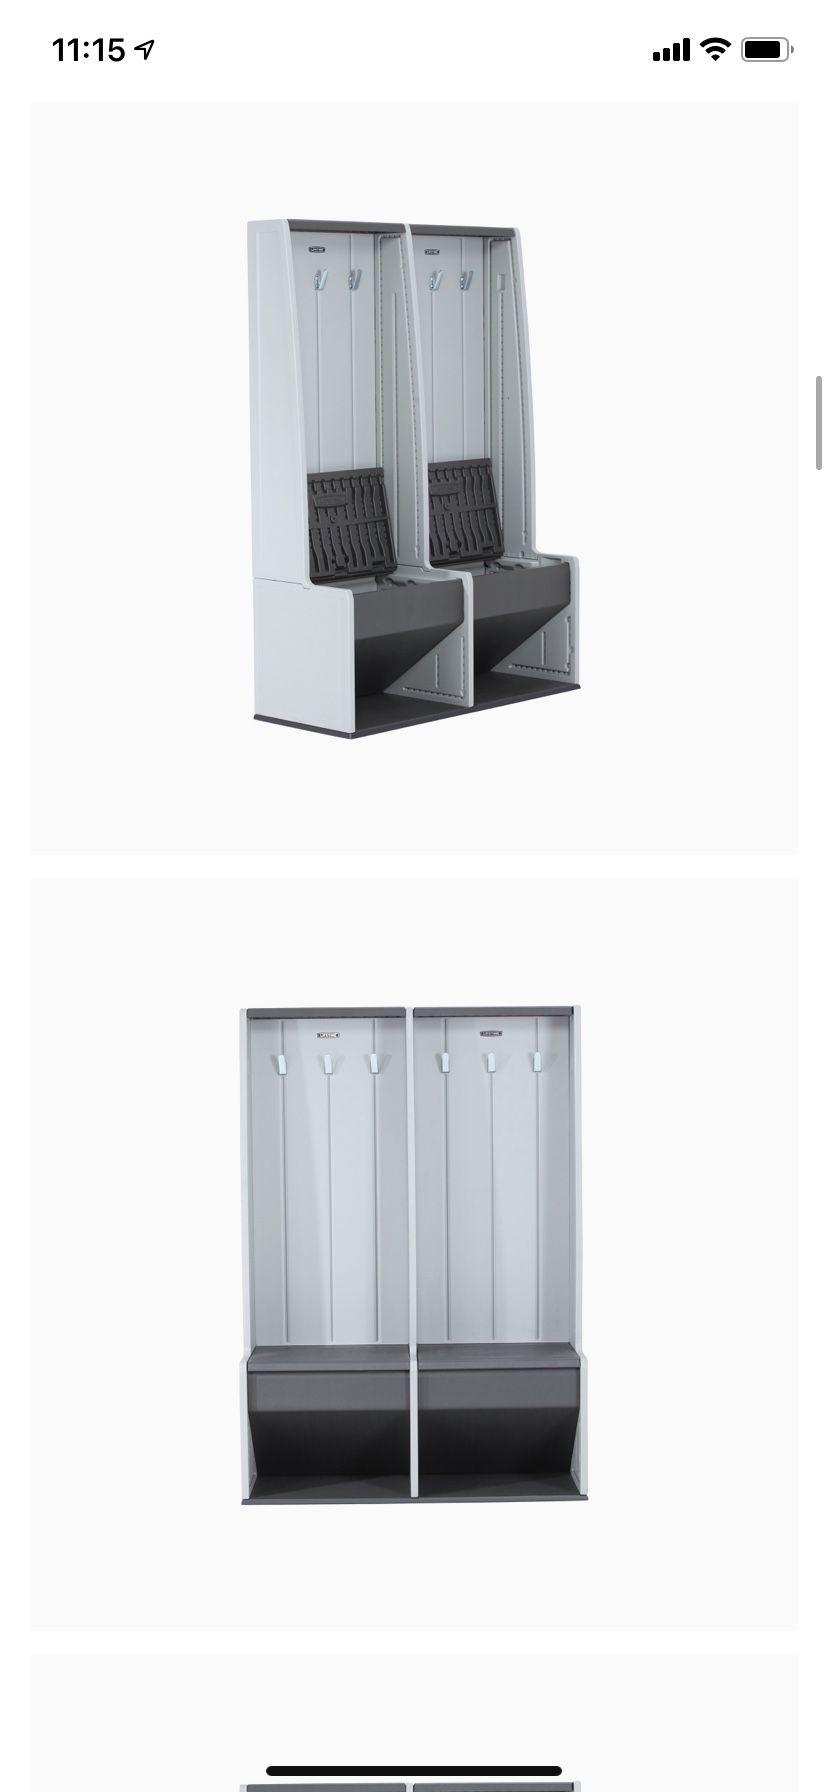 Lifetime Home & Garage Storage Locker (entry Way Hall Tree)